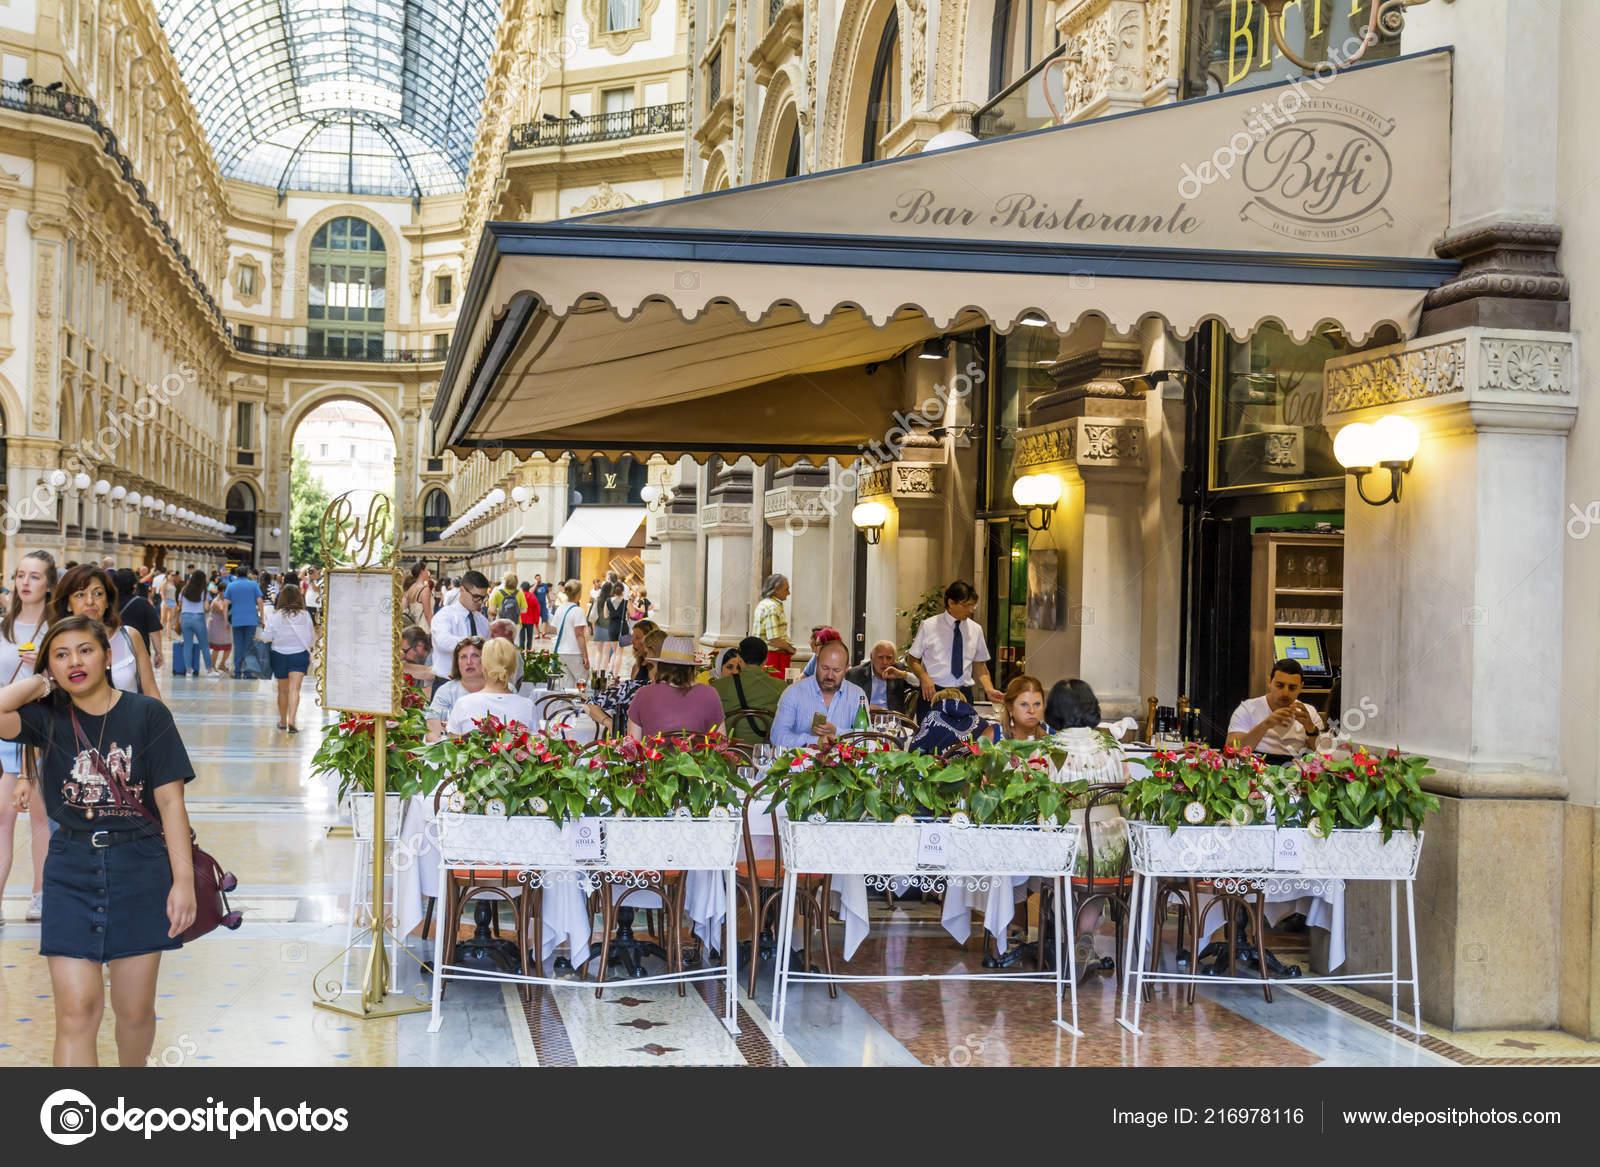 EUROPEAN CAFE RESTAURANT